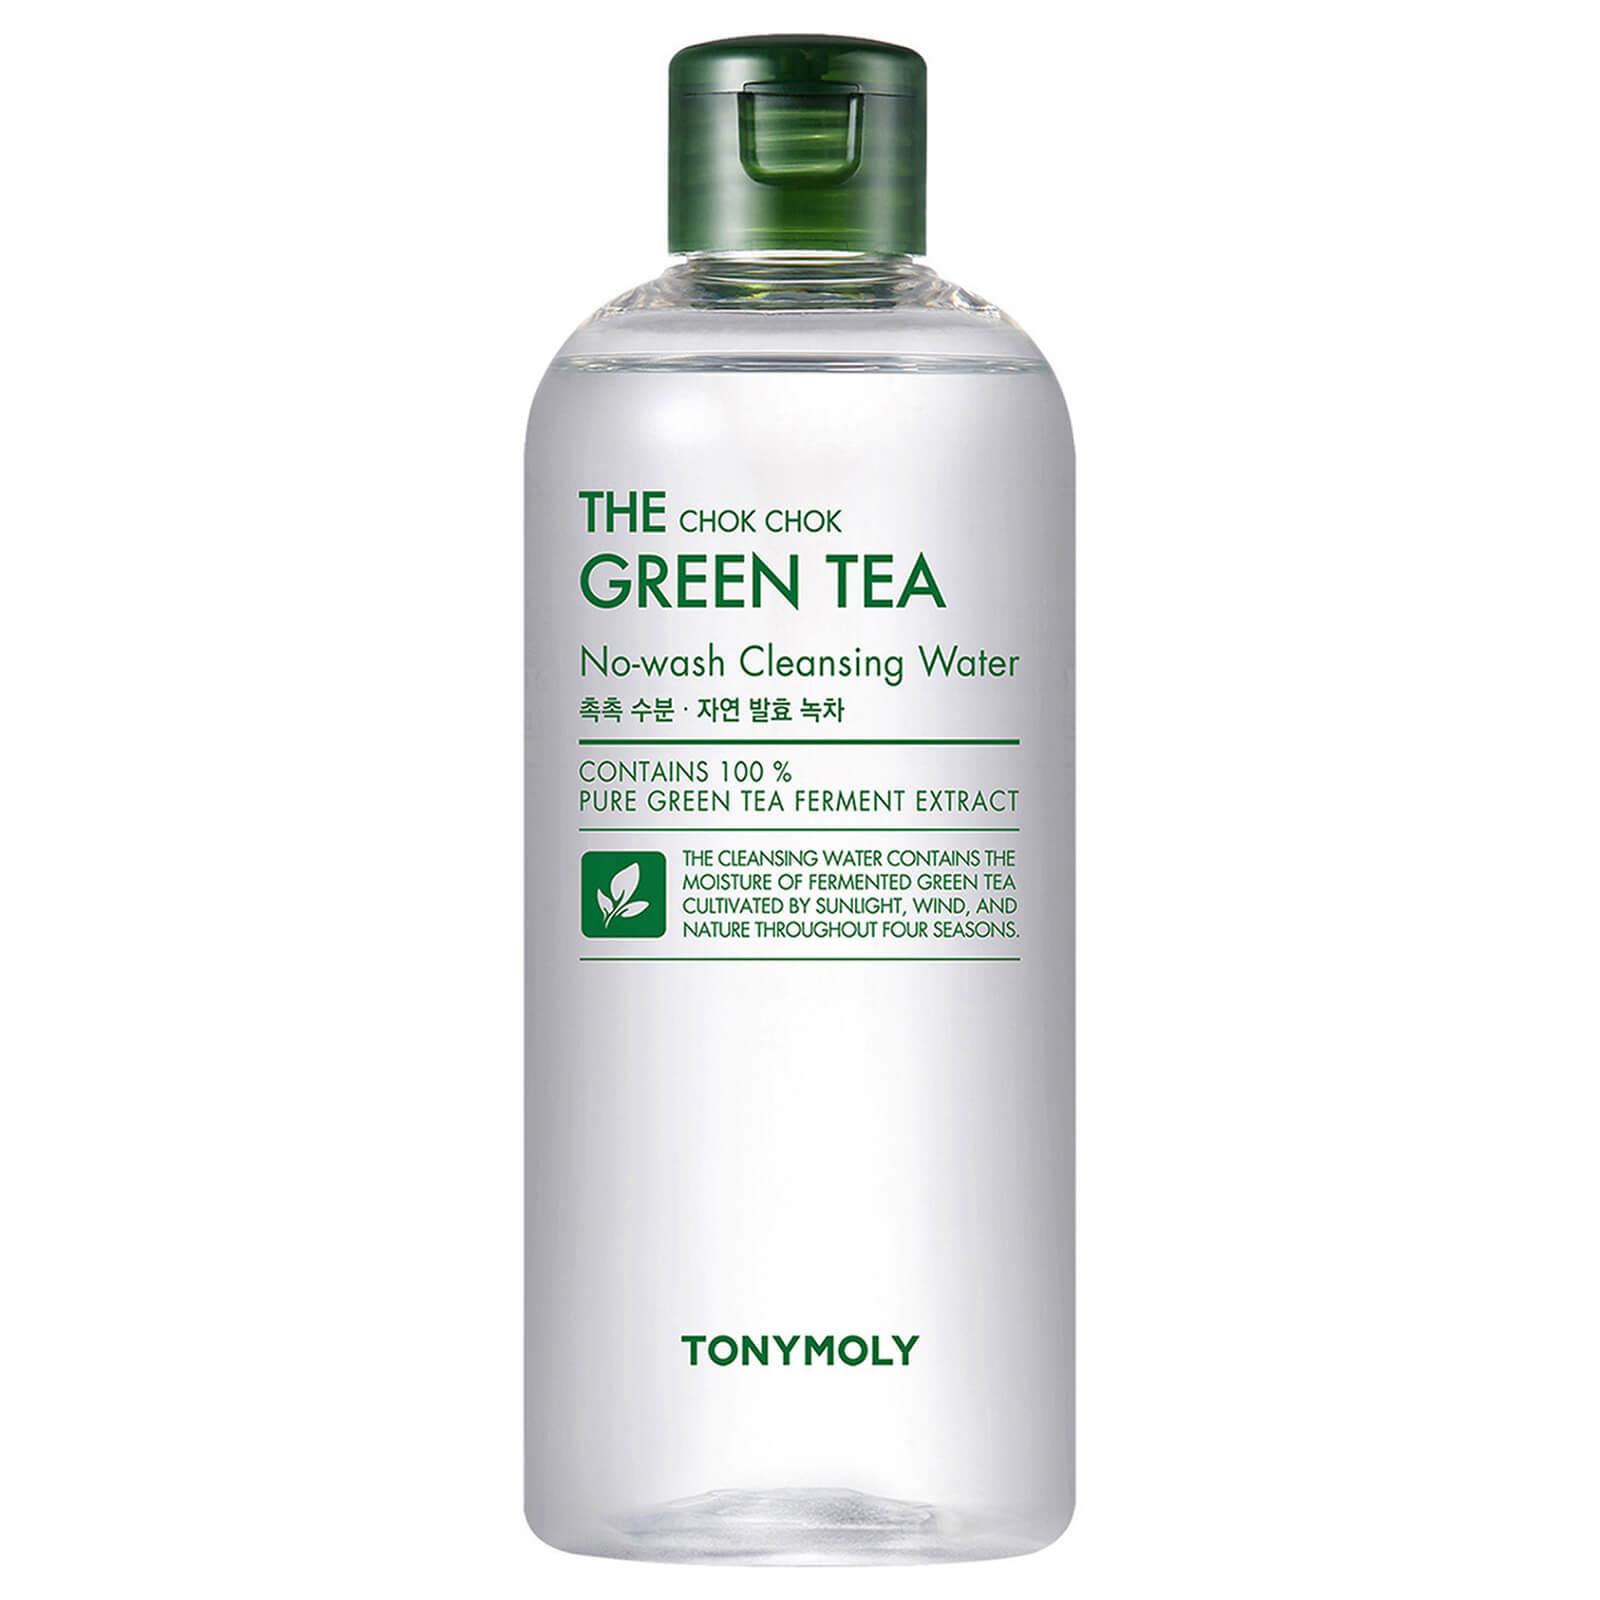 Купить TONYMOLY The Chok Chok Green Tea No-Wash Cleansing Water 300ml